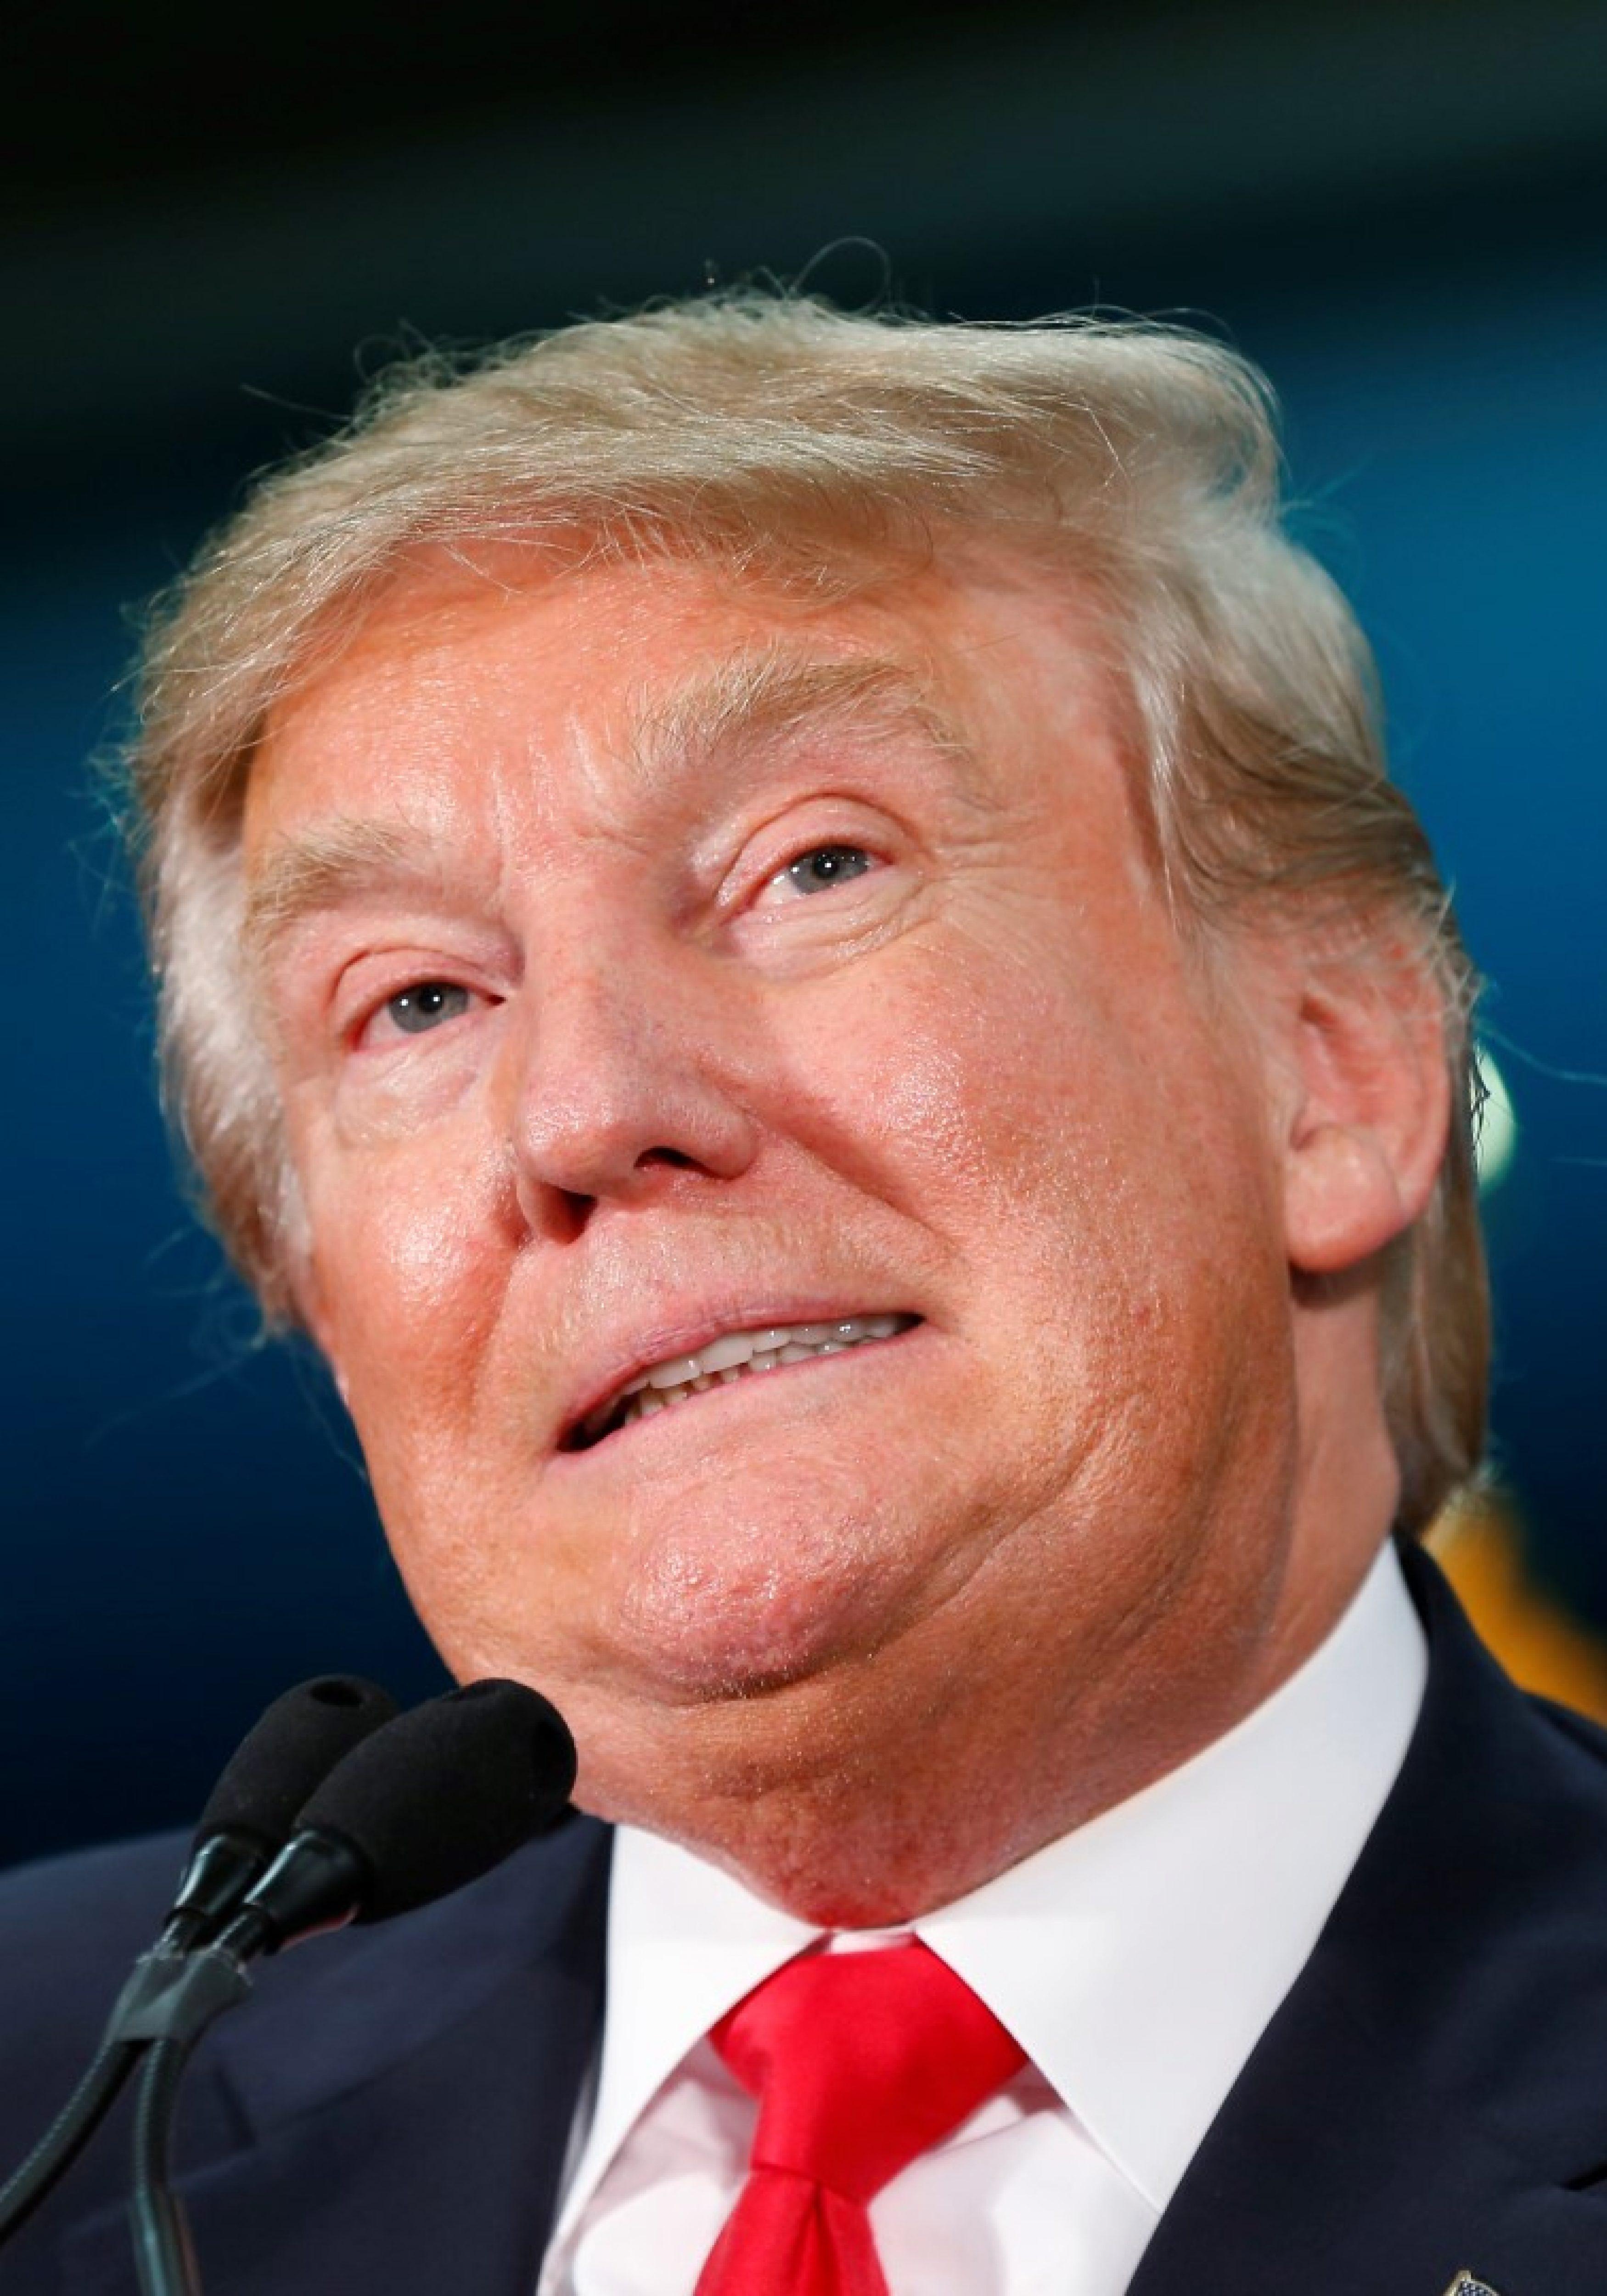 Trump-University-06.07-Large-3500x5000.jpg